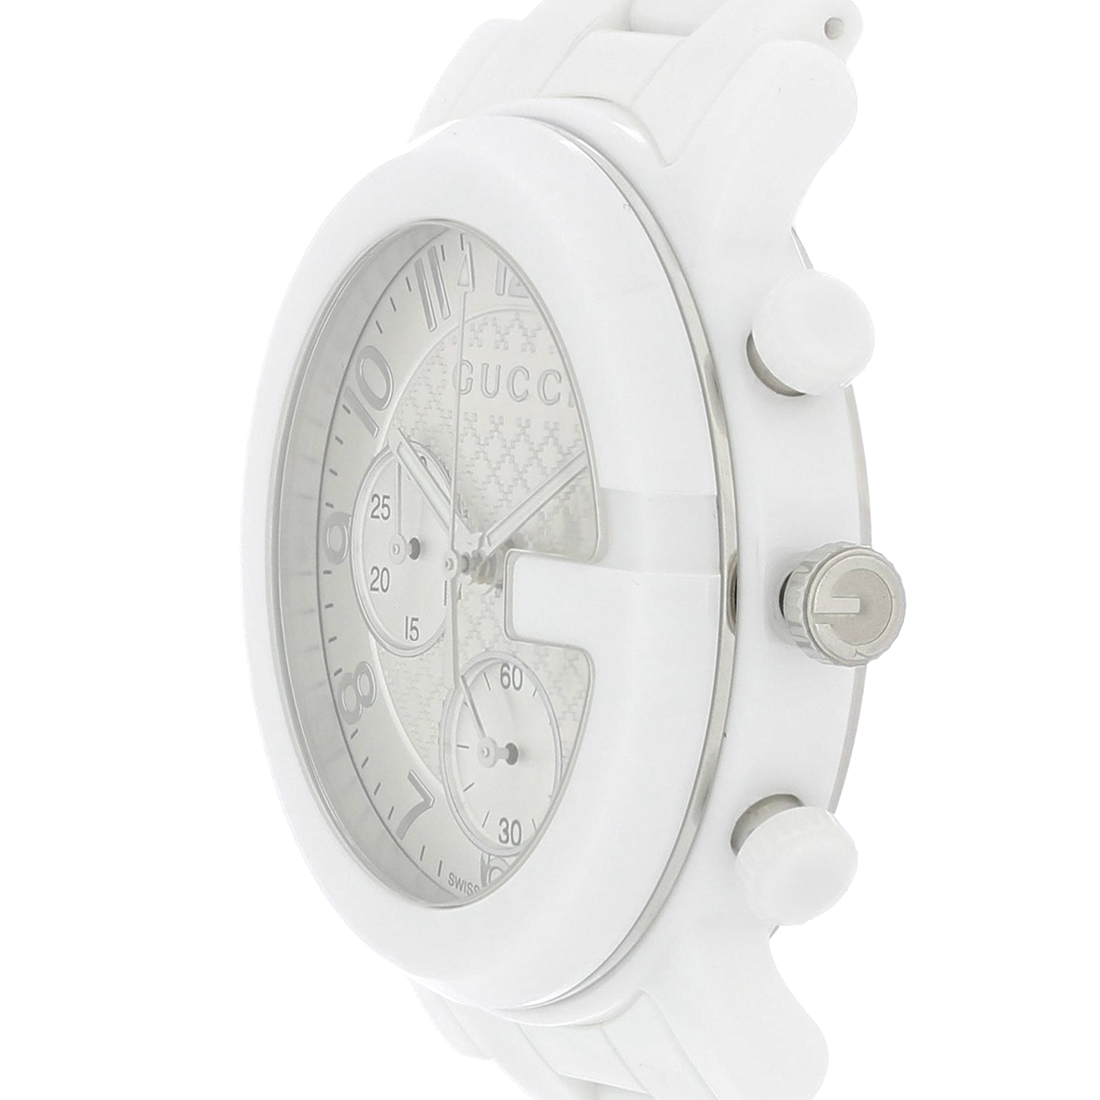 affbff7cf31 Gucci 101 G Ladies White Ceramic Swiss Quartz Chronograph Watch YA101353